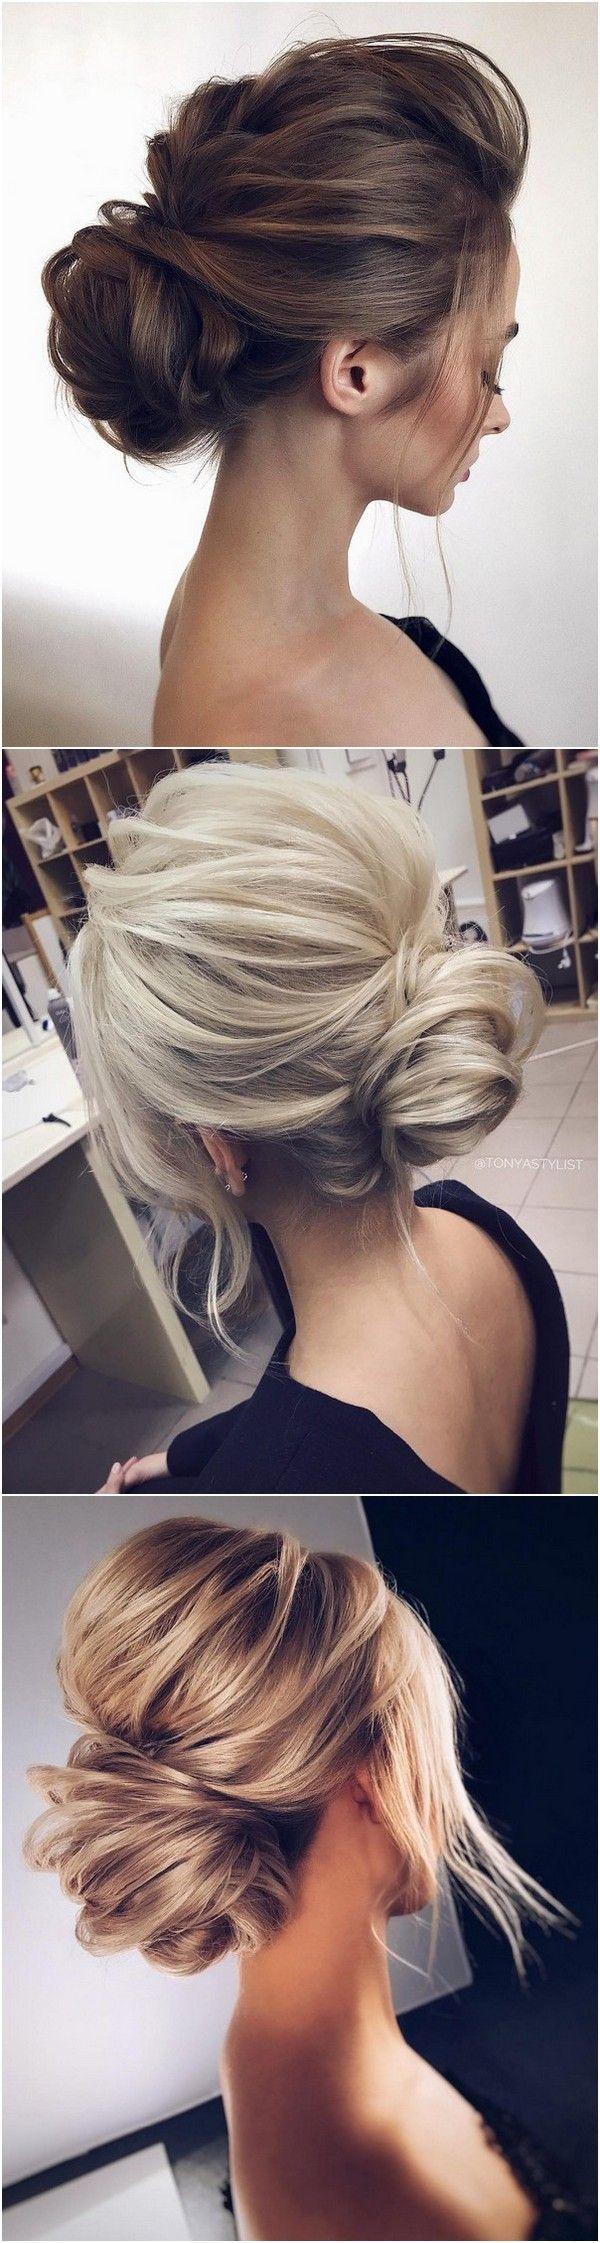 Elegant updo wedding hairstylesweddinghairstyles bridalfashion